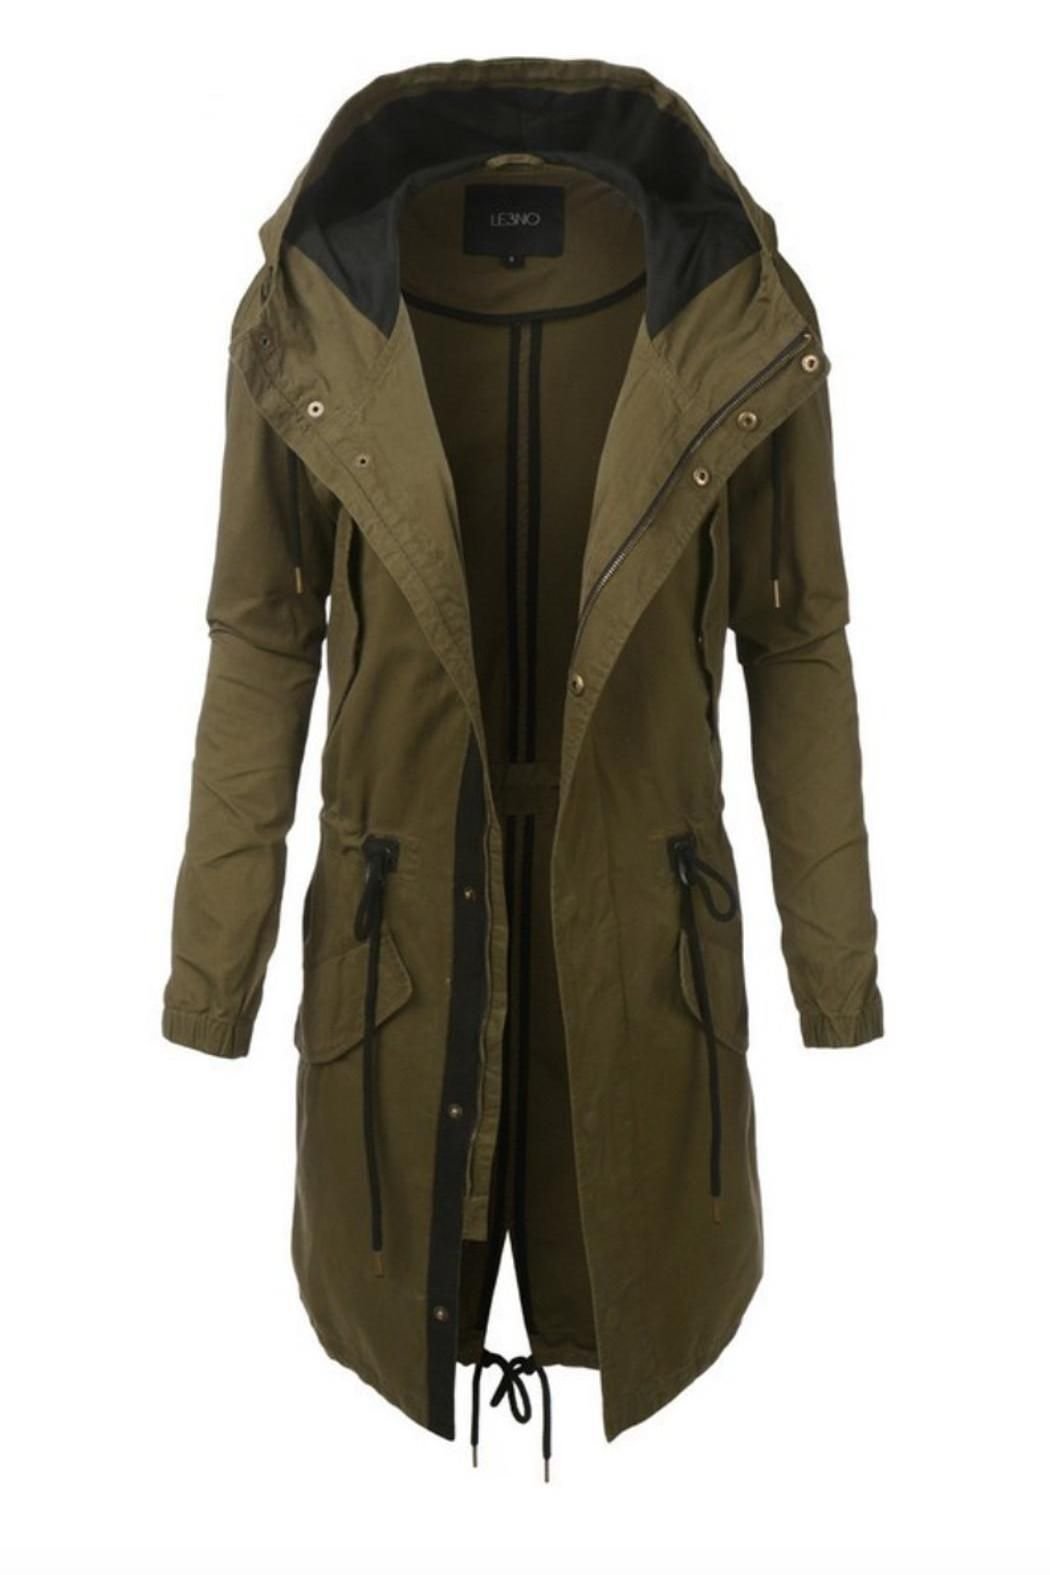 Long Green Parka Coats